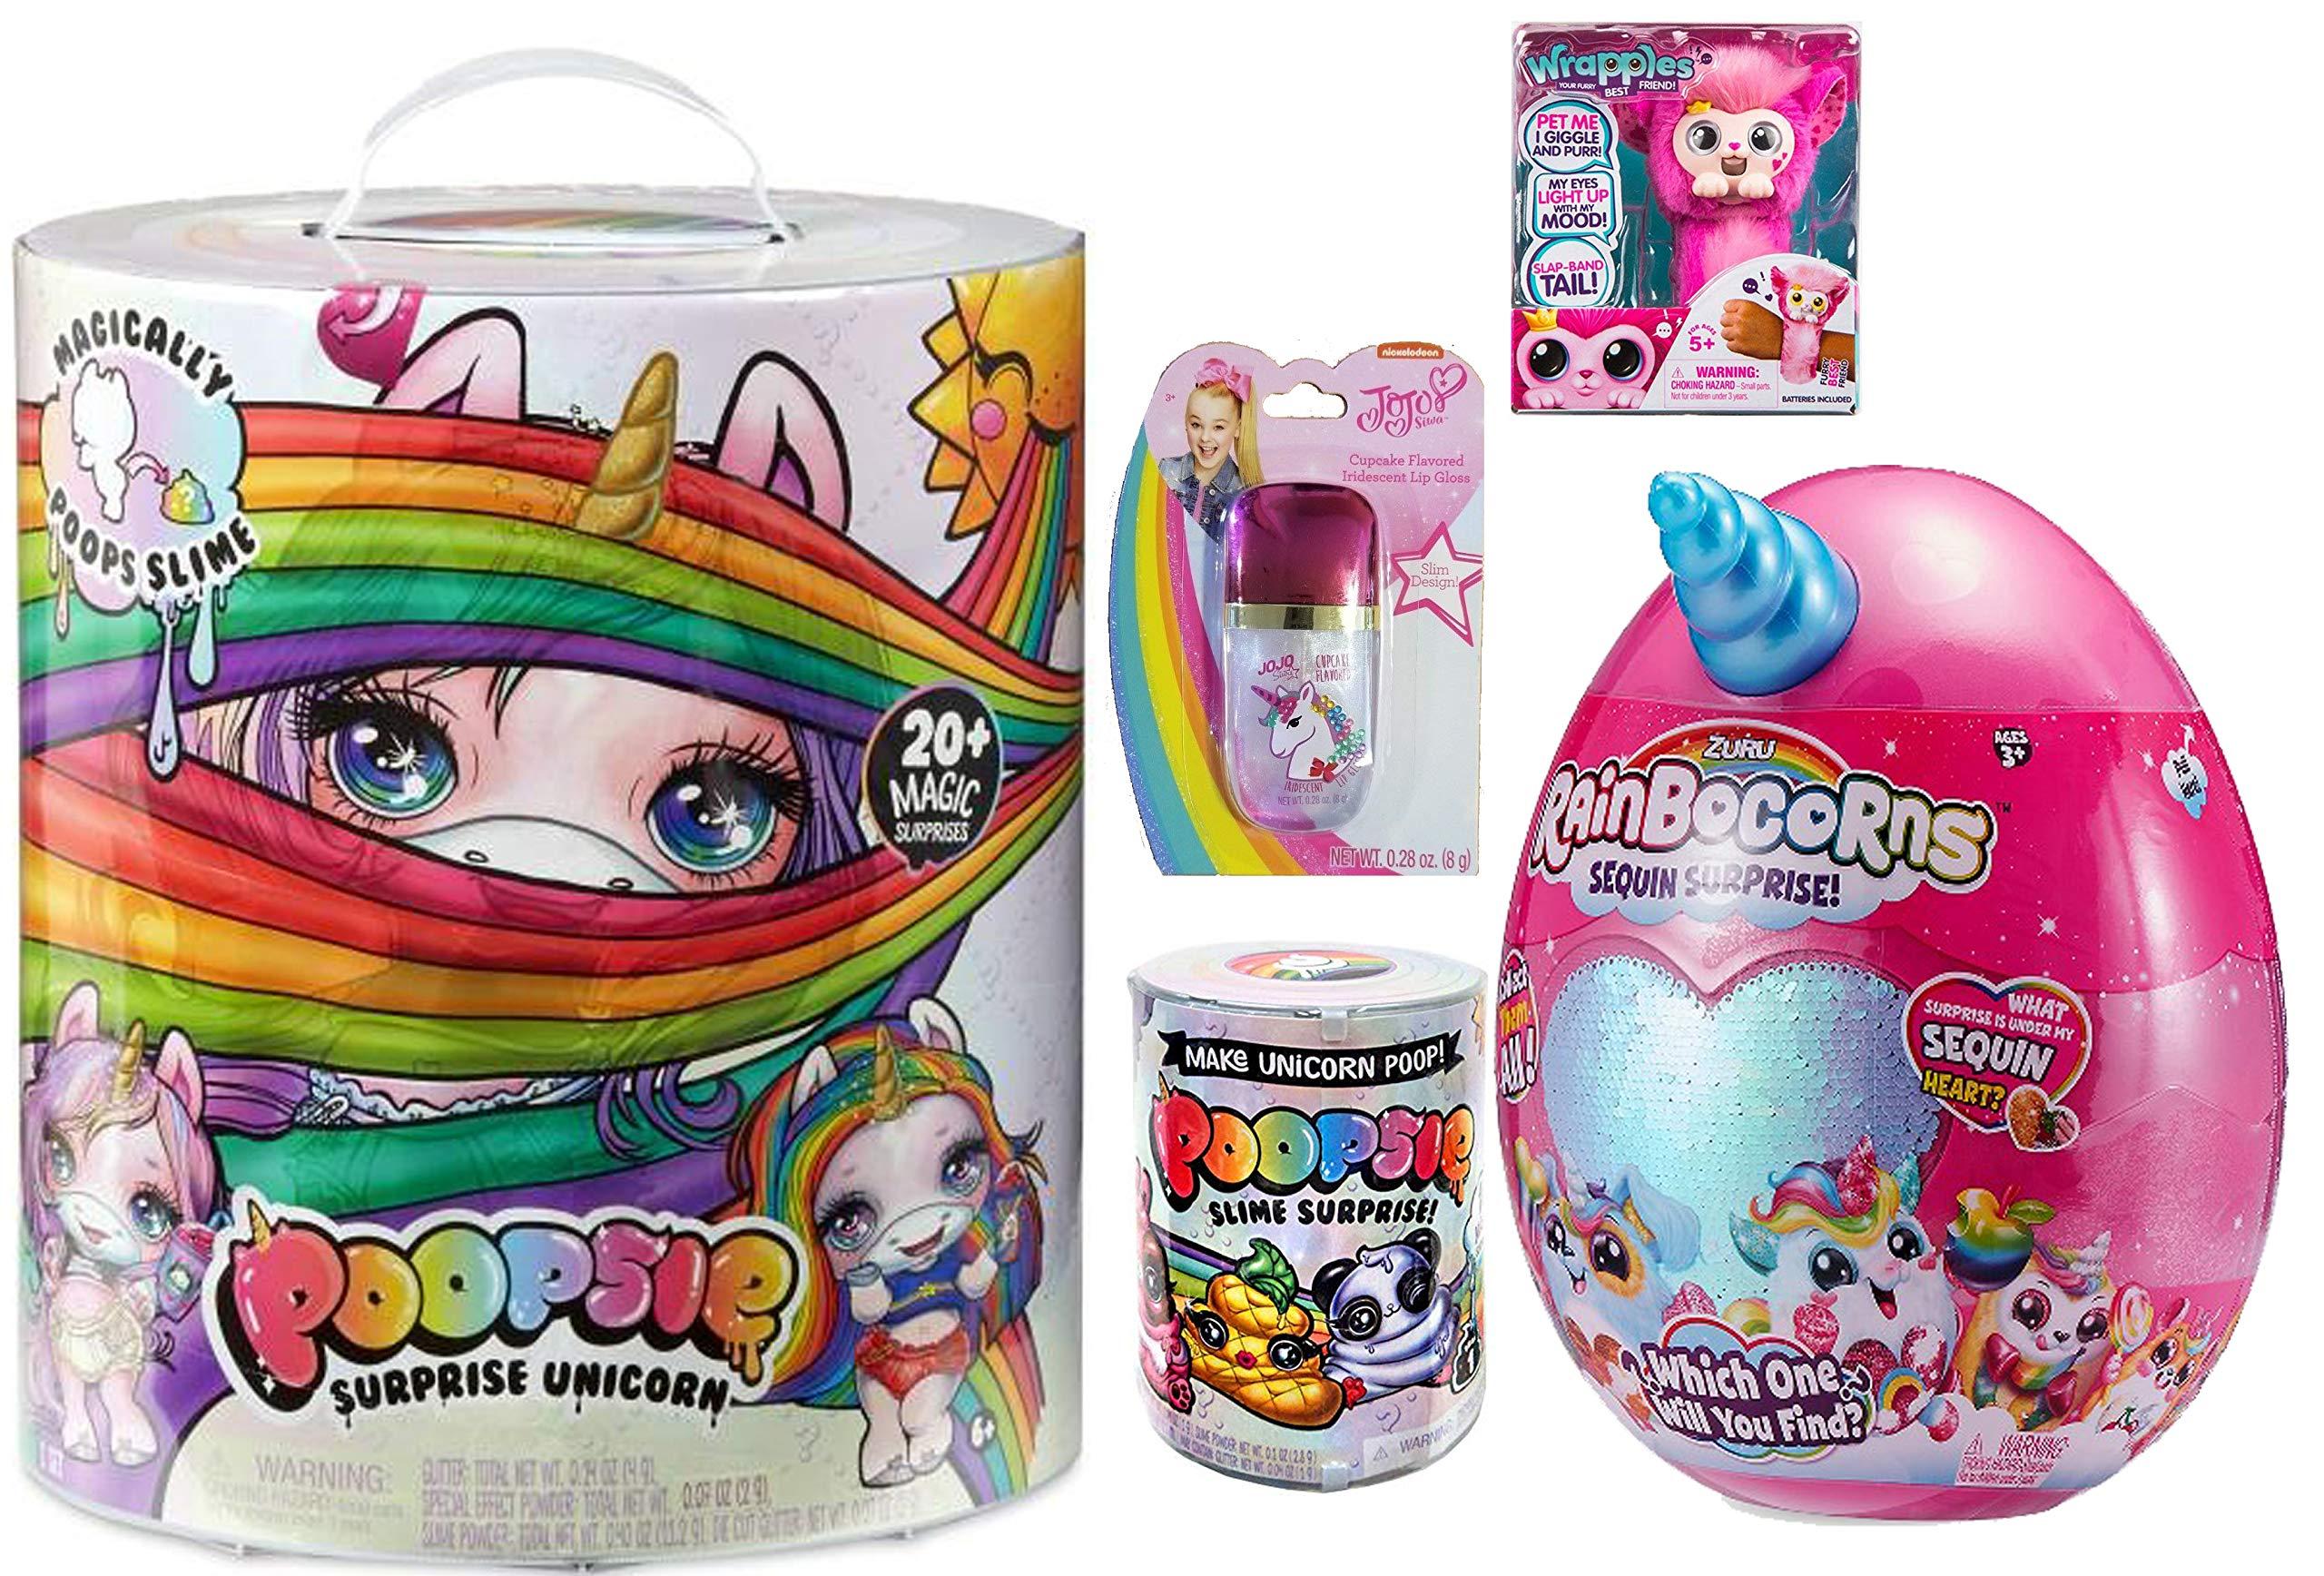 Poopsie Slime Surprise Unicorn, Raiborcorn, JoJo Siwa Unicorn Lip Gloss Slime Surprise Slime Bundle (Blue rainbocorn)